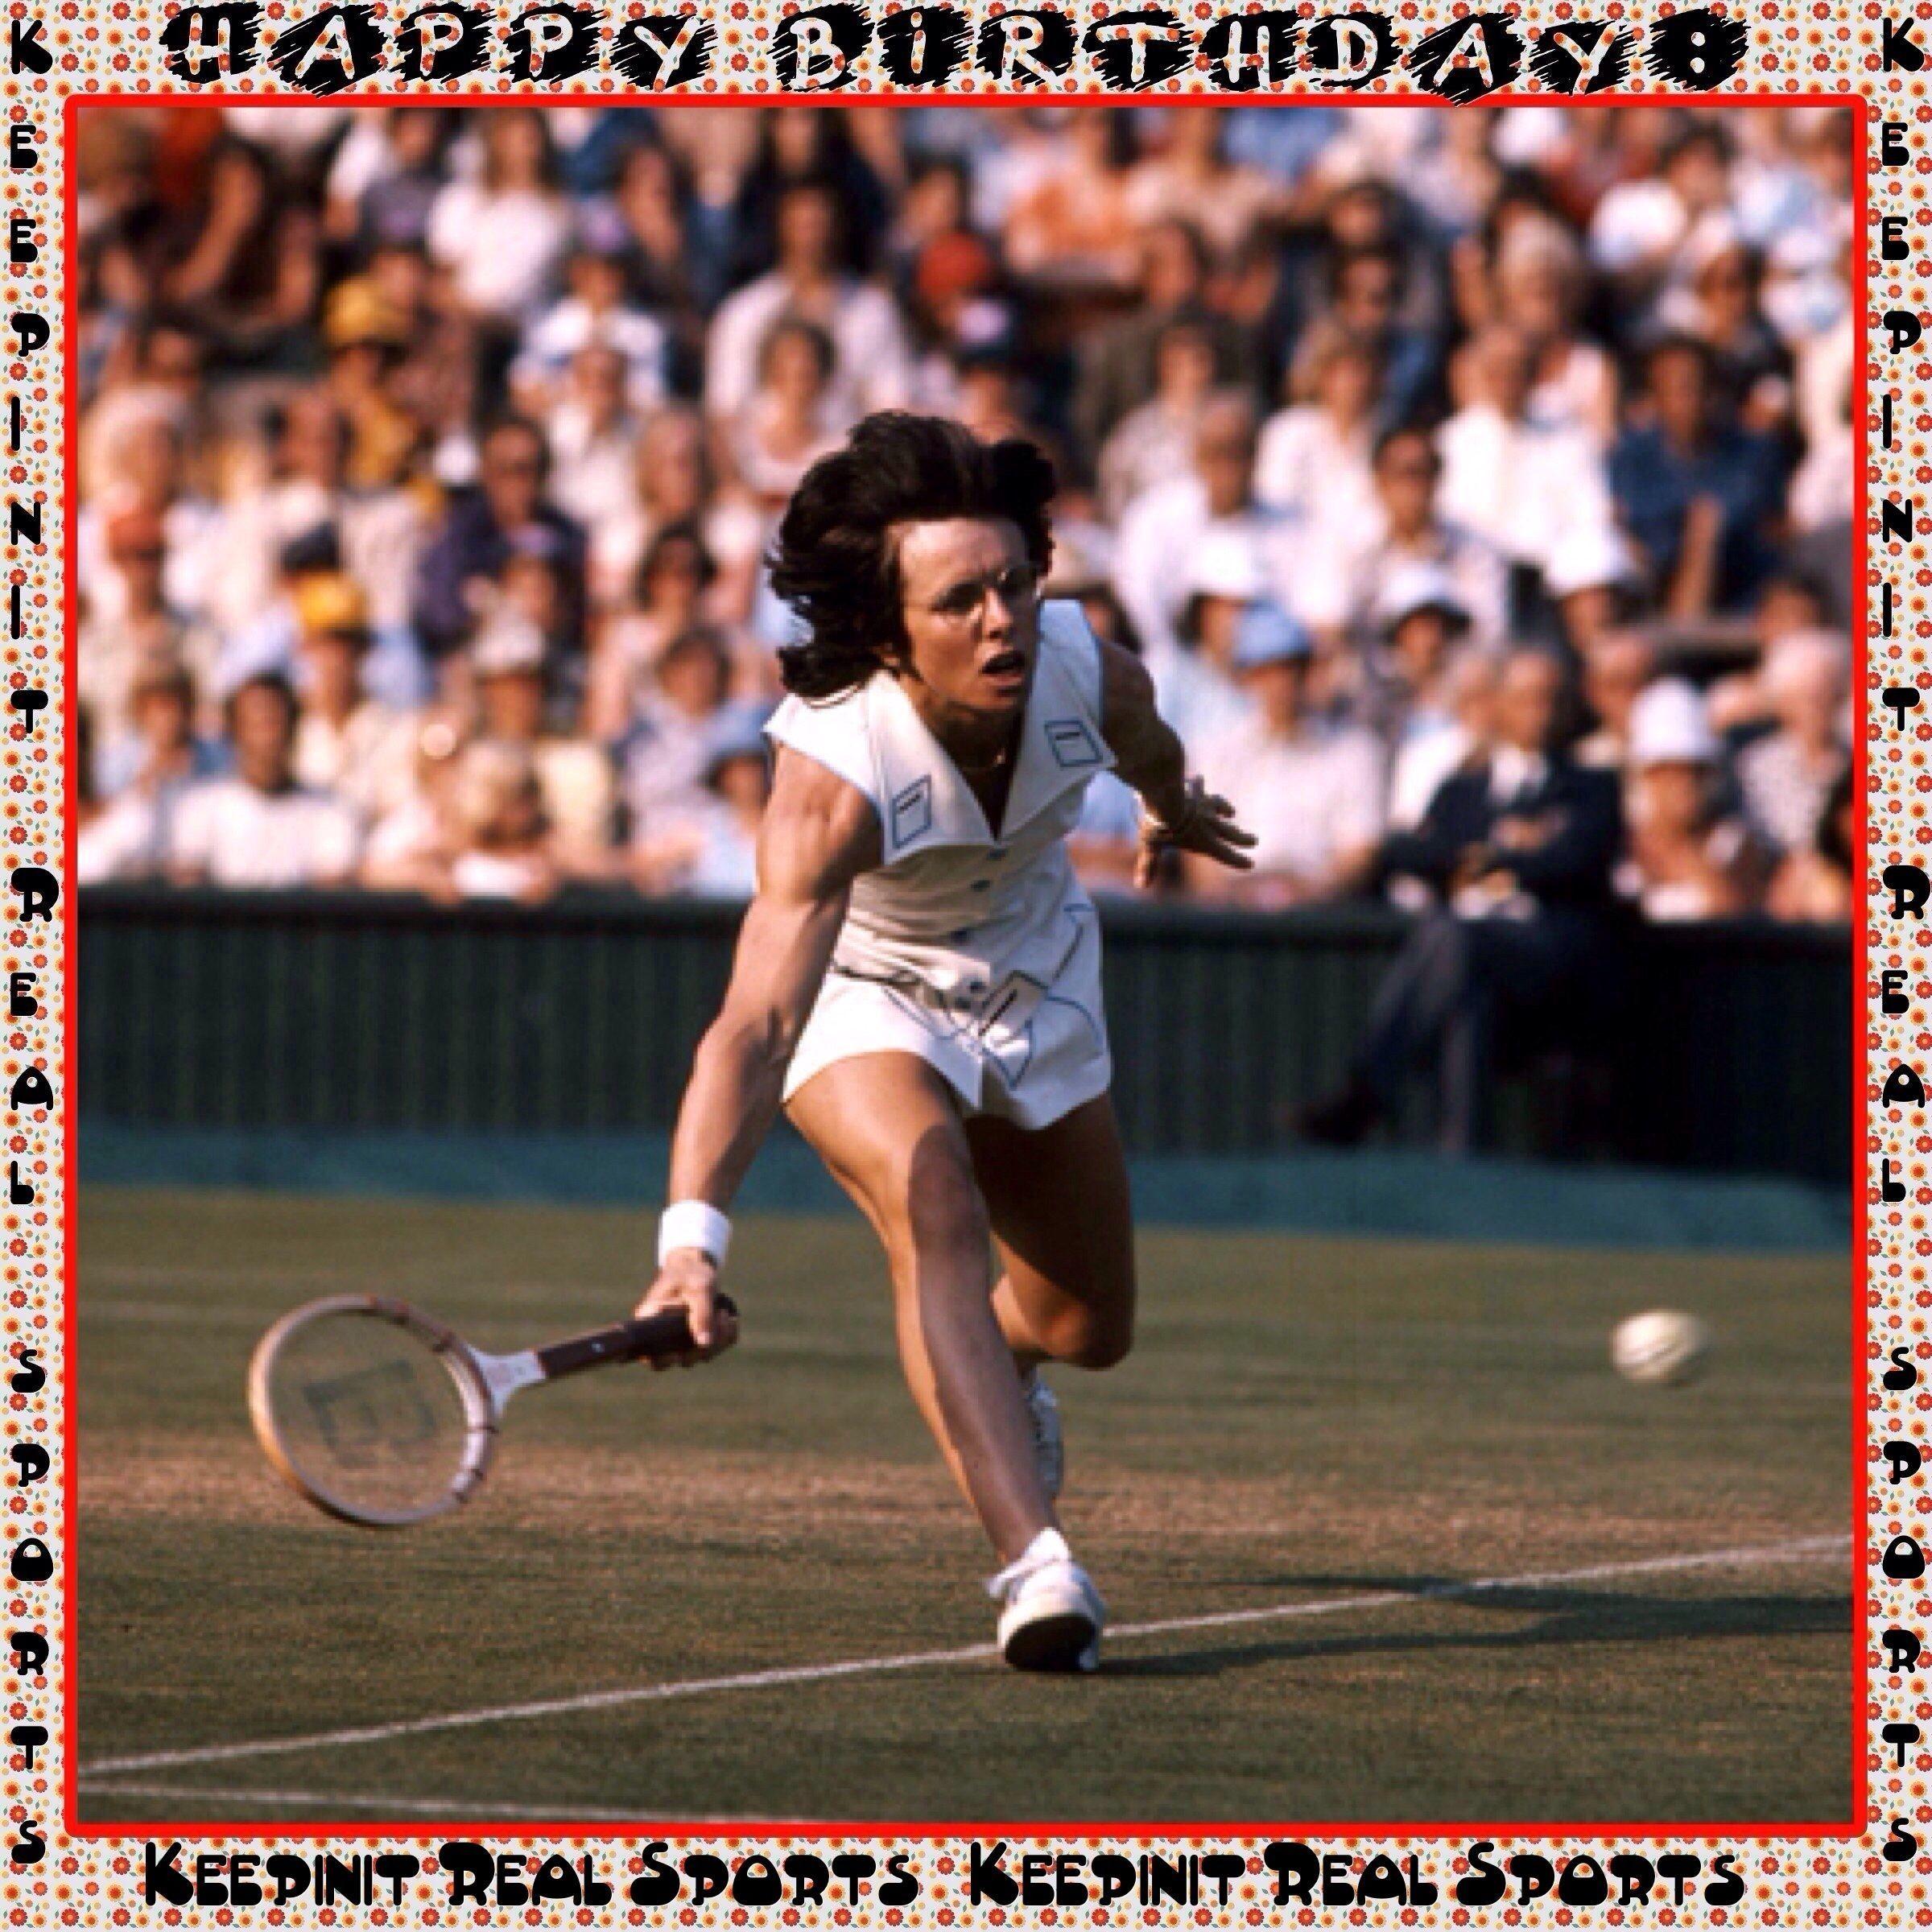 Billie Jean King 12 Grand Slam singles titles